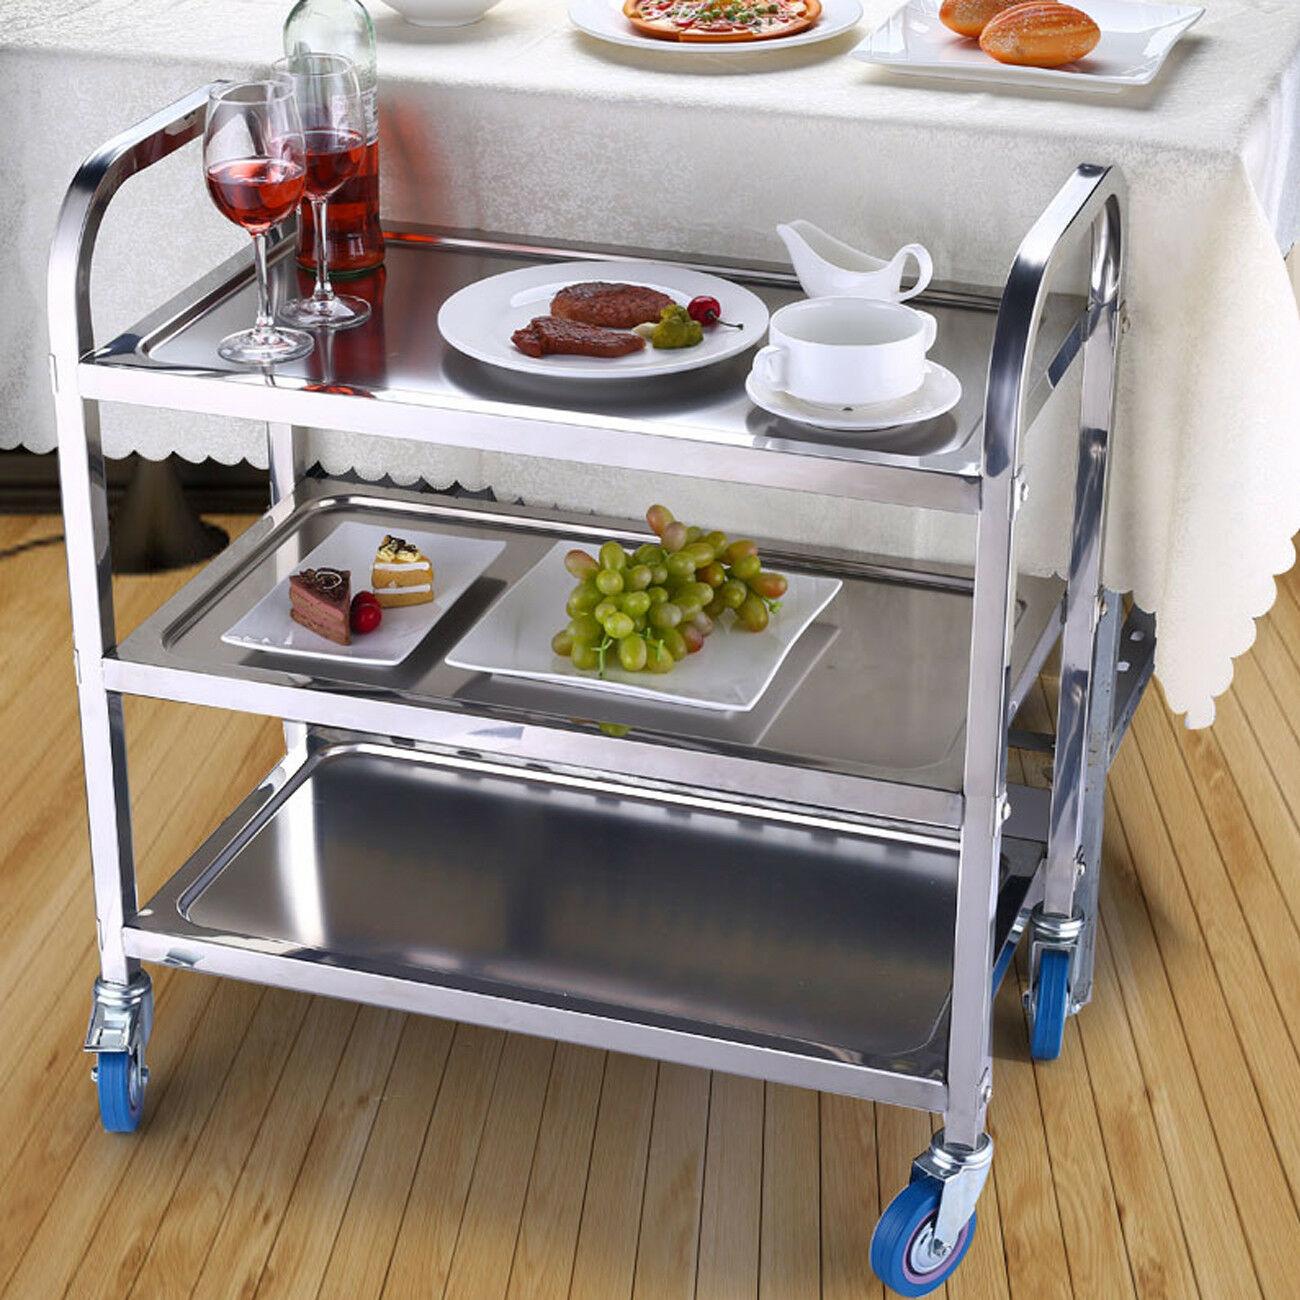 96*50*93.5cm Stainless Steel Serving Trolley Kitchen Trolley Storage Rack Holder